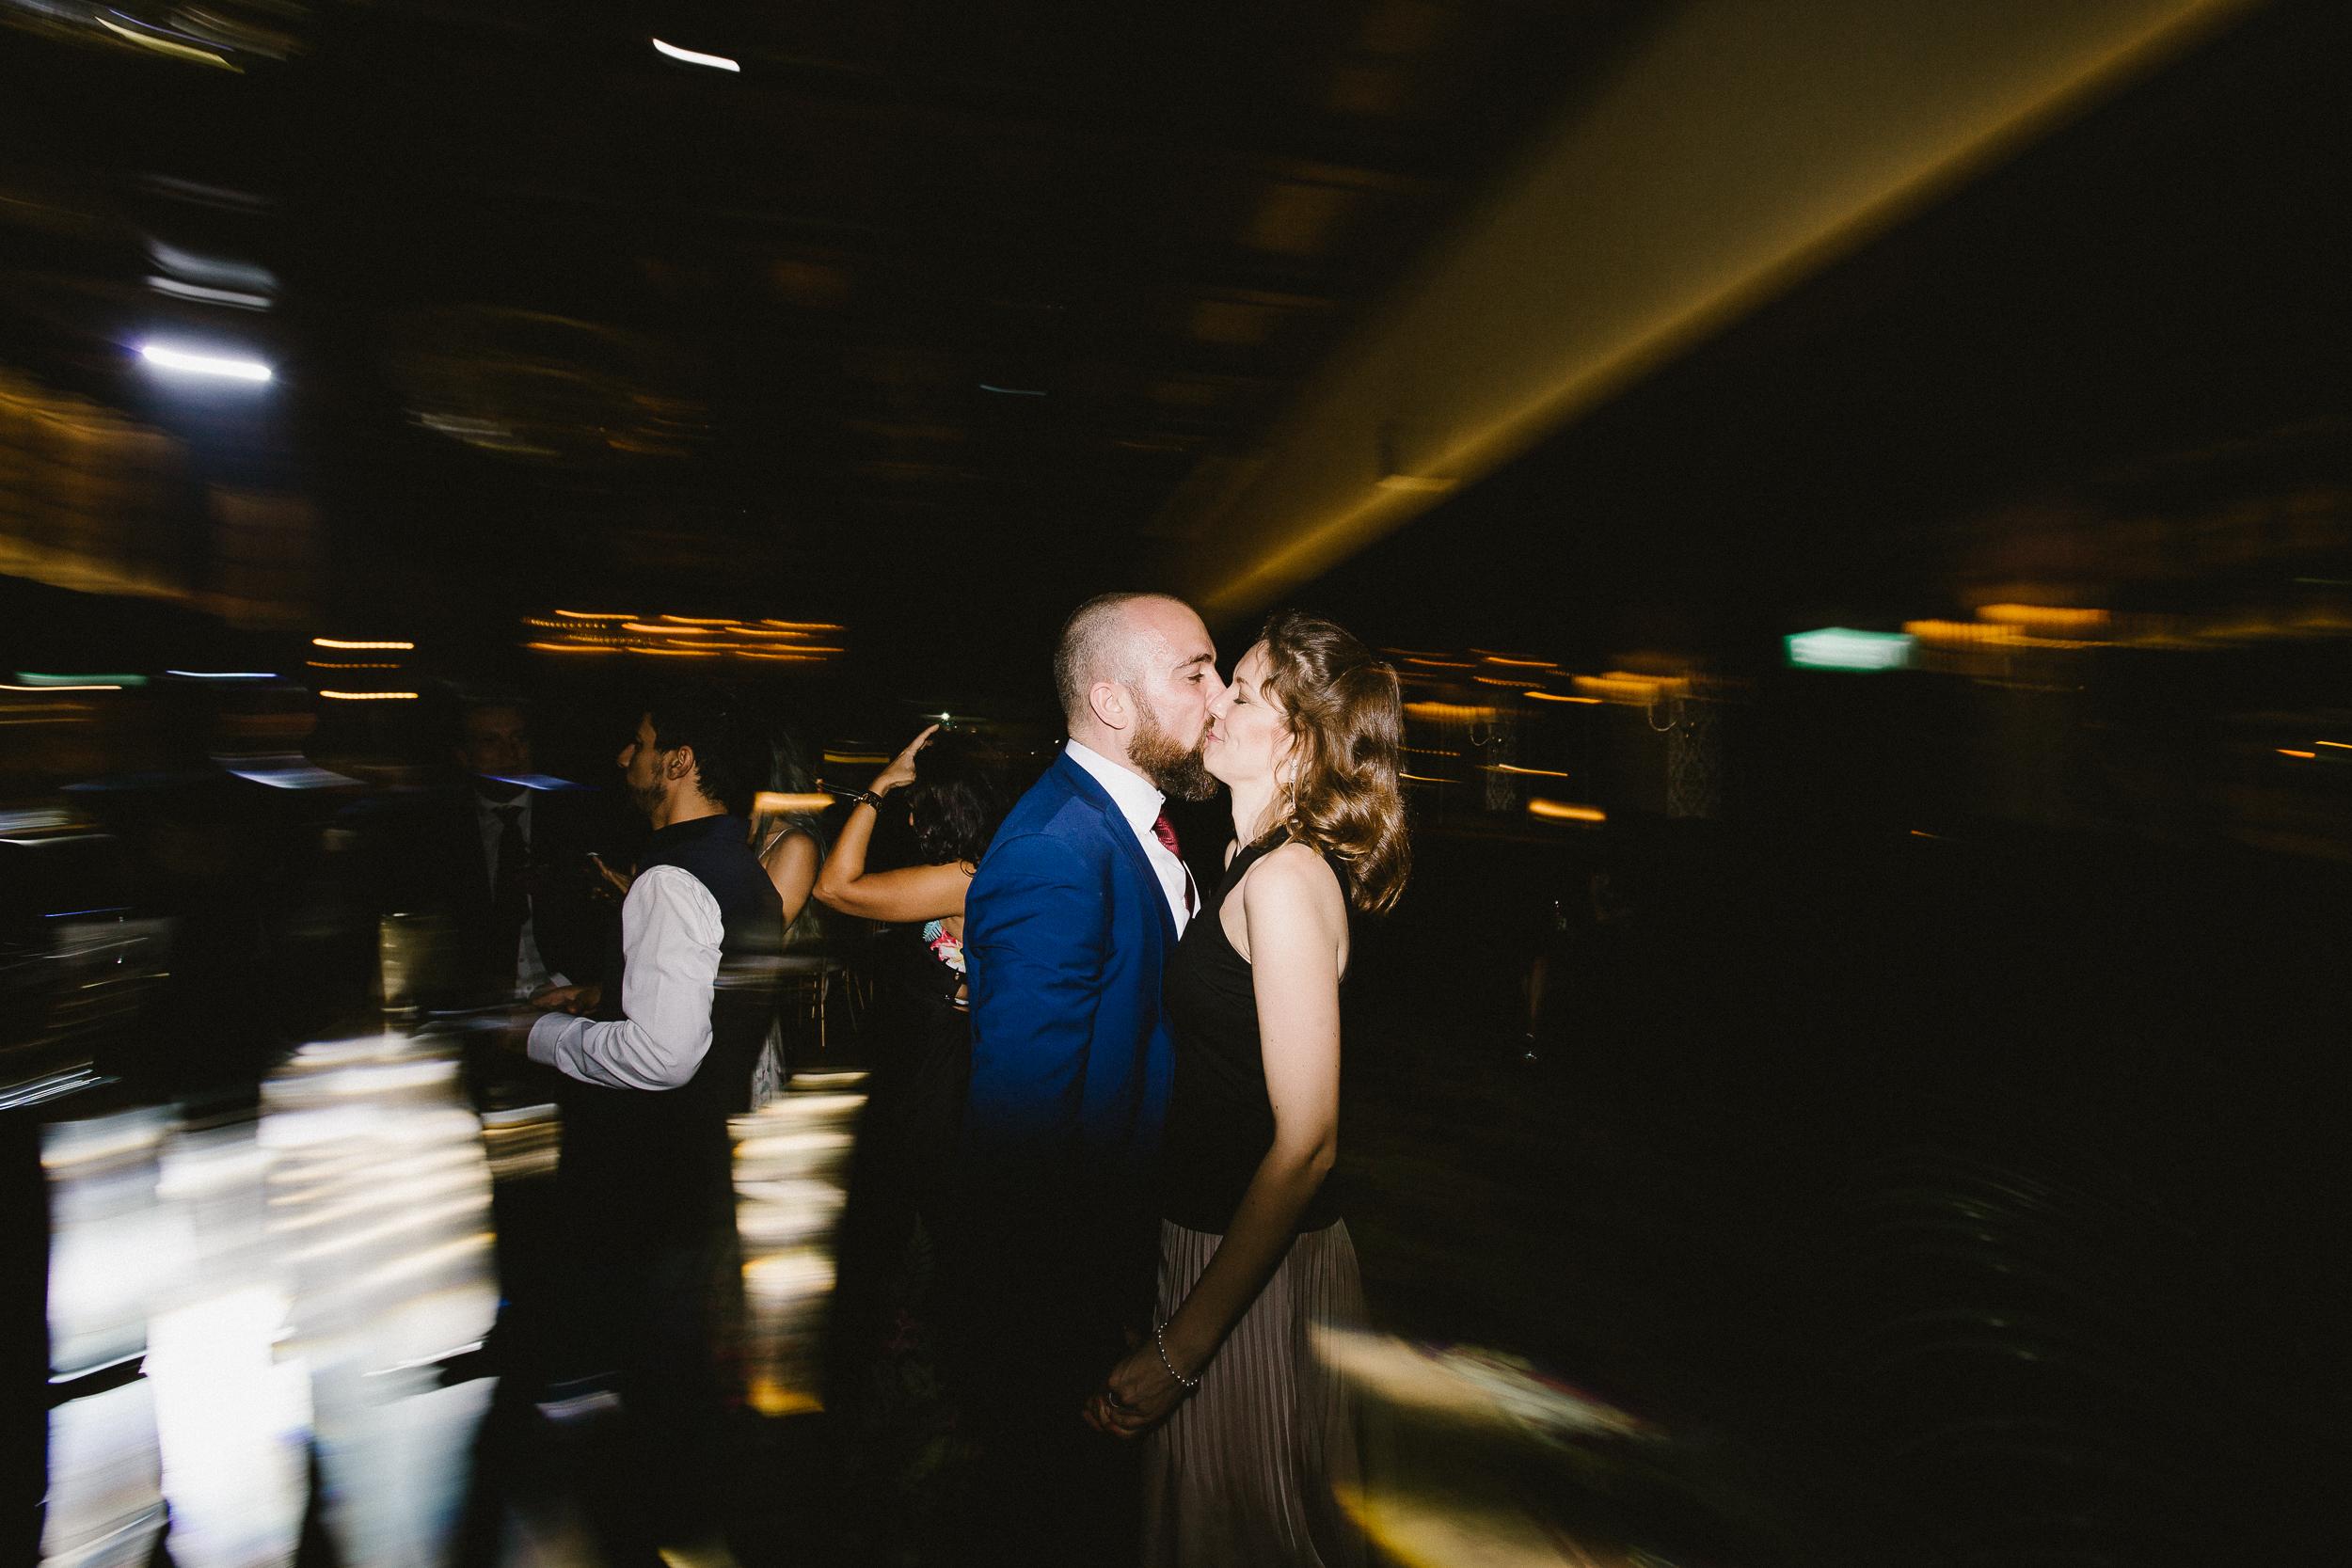 Singapore+Actual+Day+Wedding+Photographer+Raffles+Town+Club+Joseph+Ailee-0084.jpg